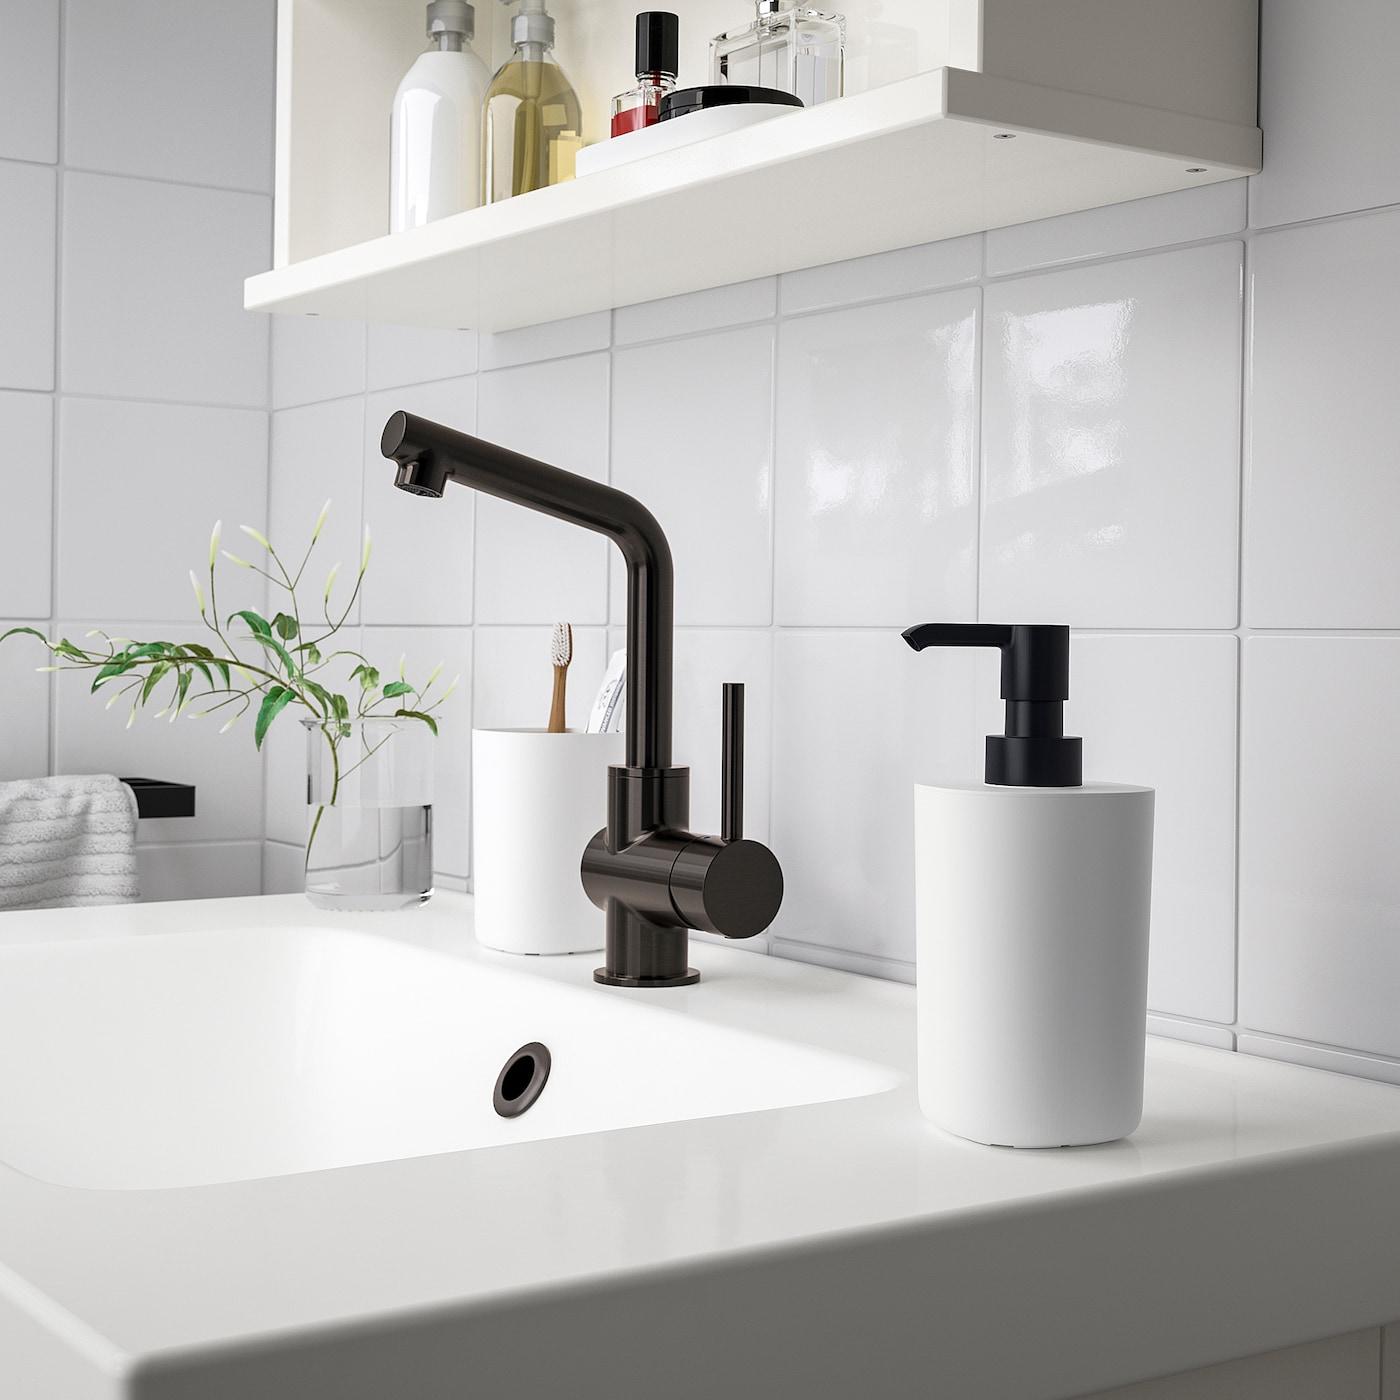 STORAVAN 3-piece bathroom set - white